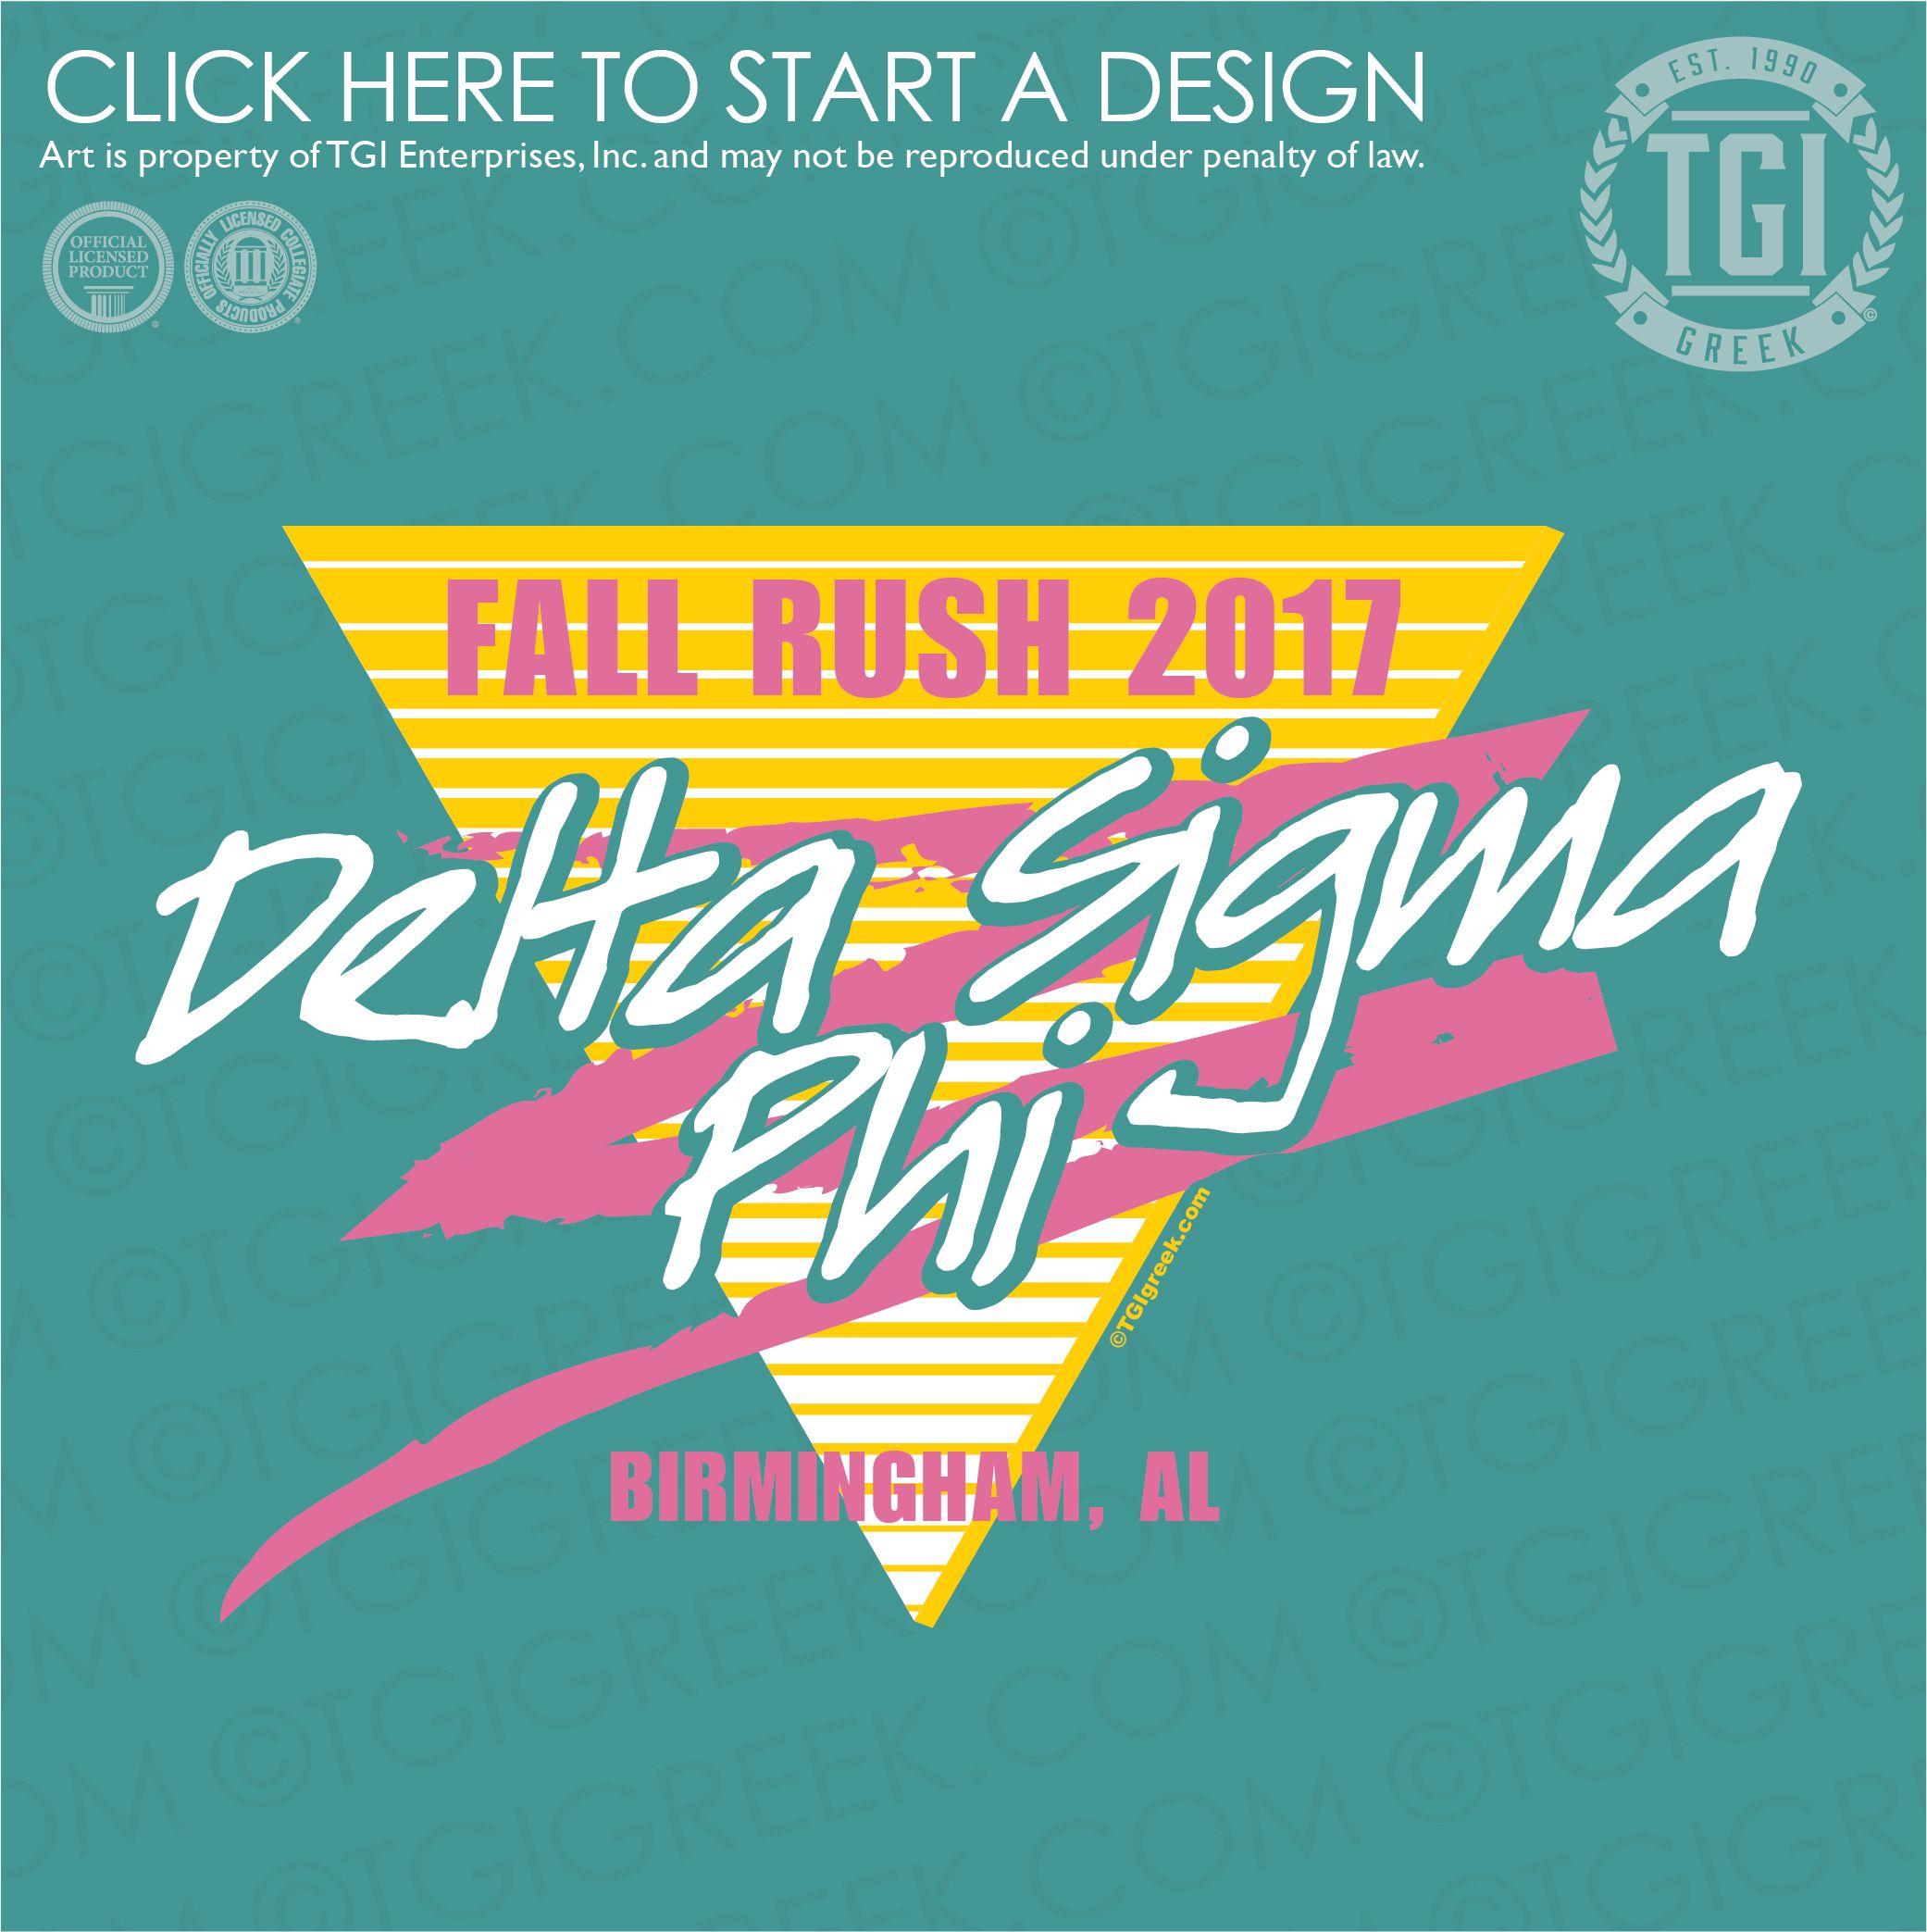 d69241202b6 Sorority Life · Custom Clothes · Design Posters · Greek Apparel · Delta  Sigma Phi | ΔΣΦ | Fall Rush | Fraternity Rush | Rush Shirt | TGI